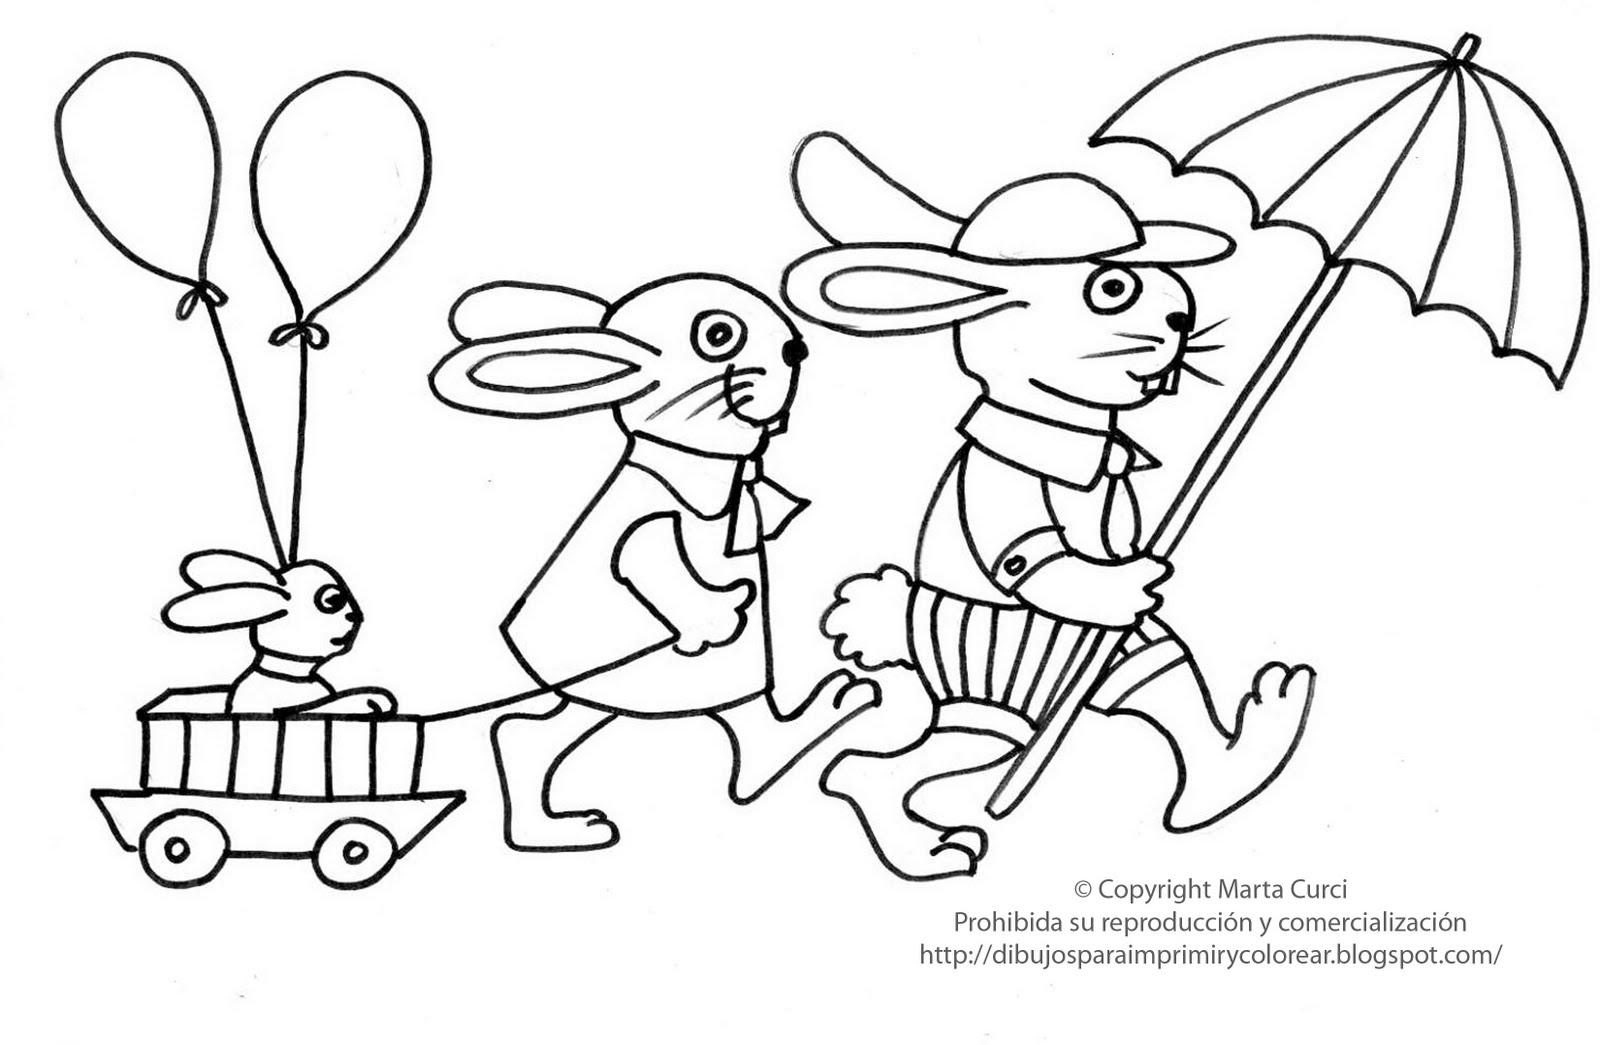 Dibujos De Niños Para Colorear E Imprimir Gratis: Dibujos Para Imprimir Y Colorear Gratis Para Niños: Dibujo